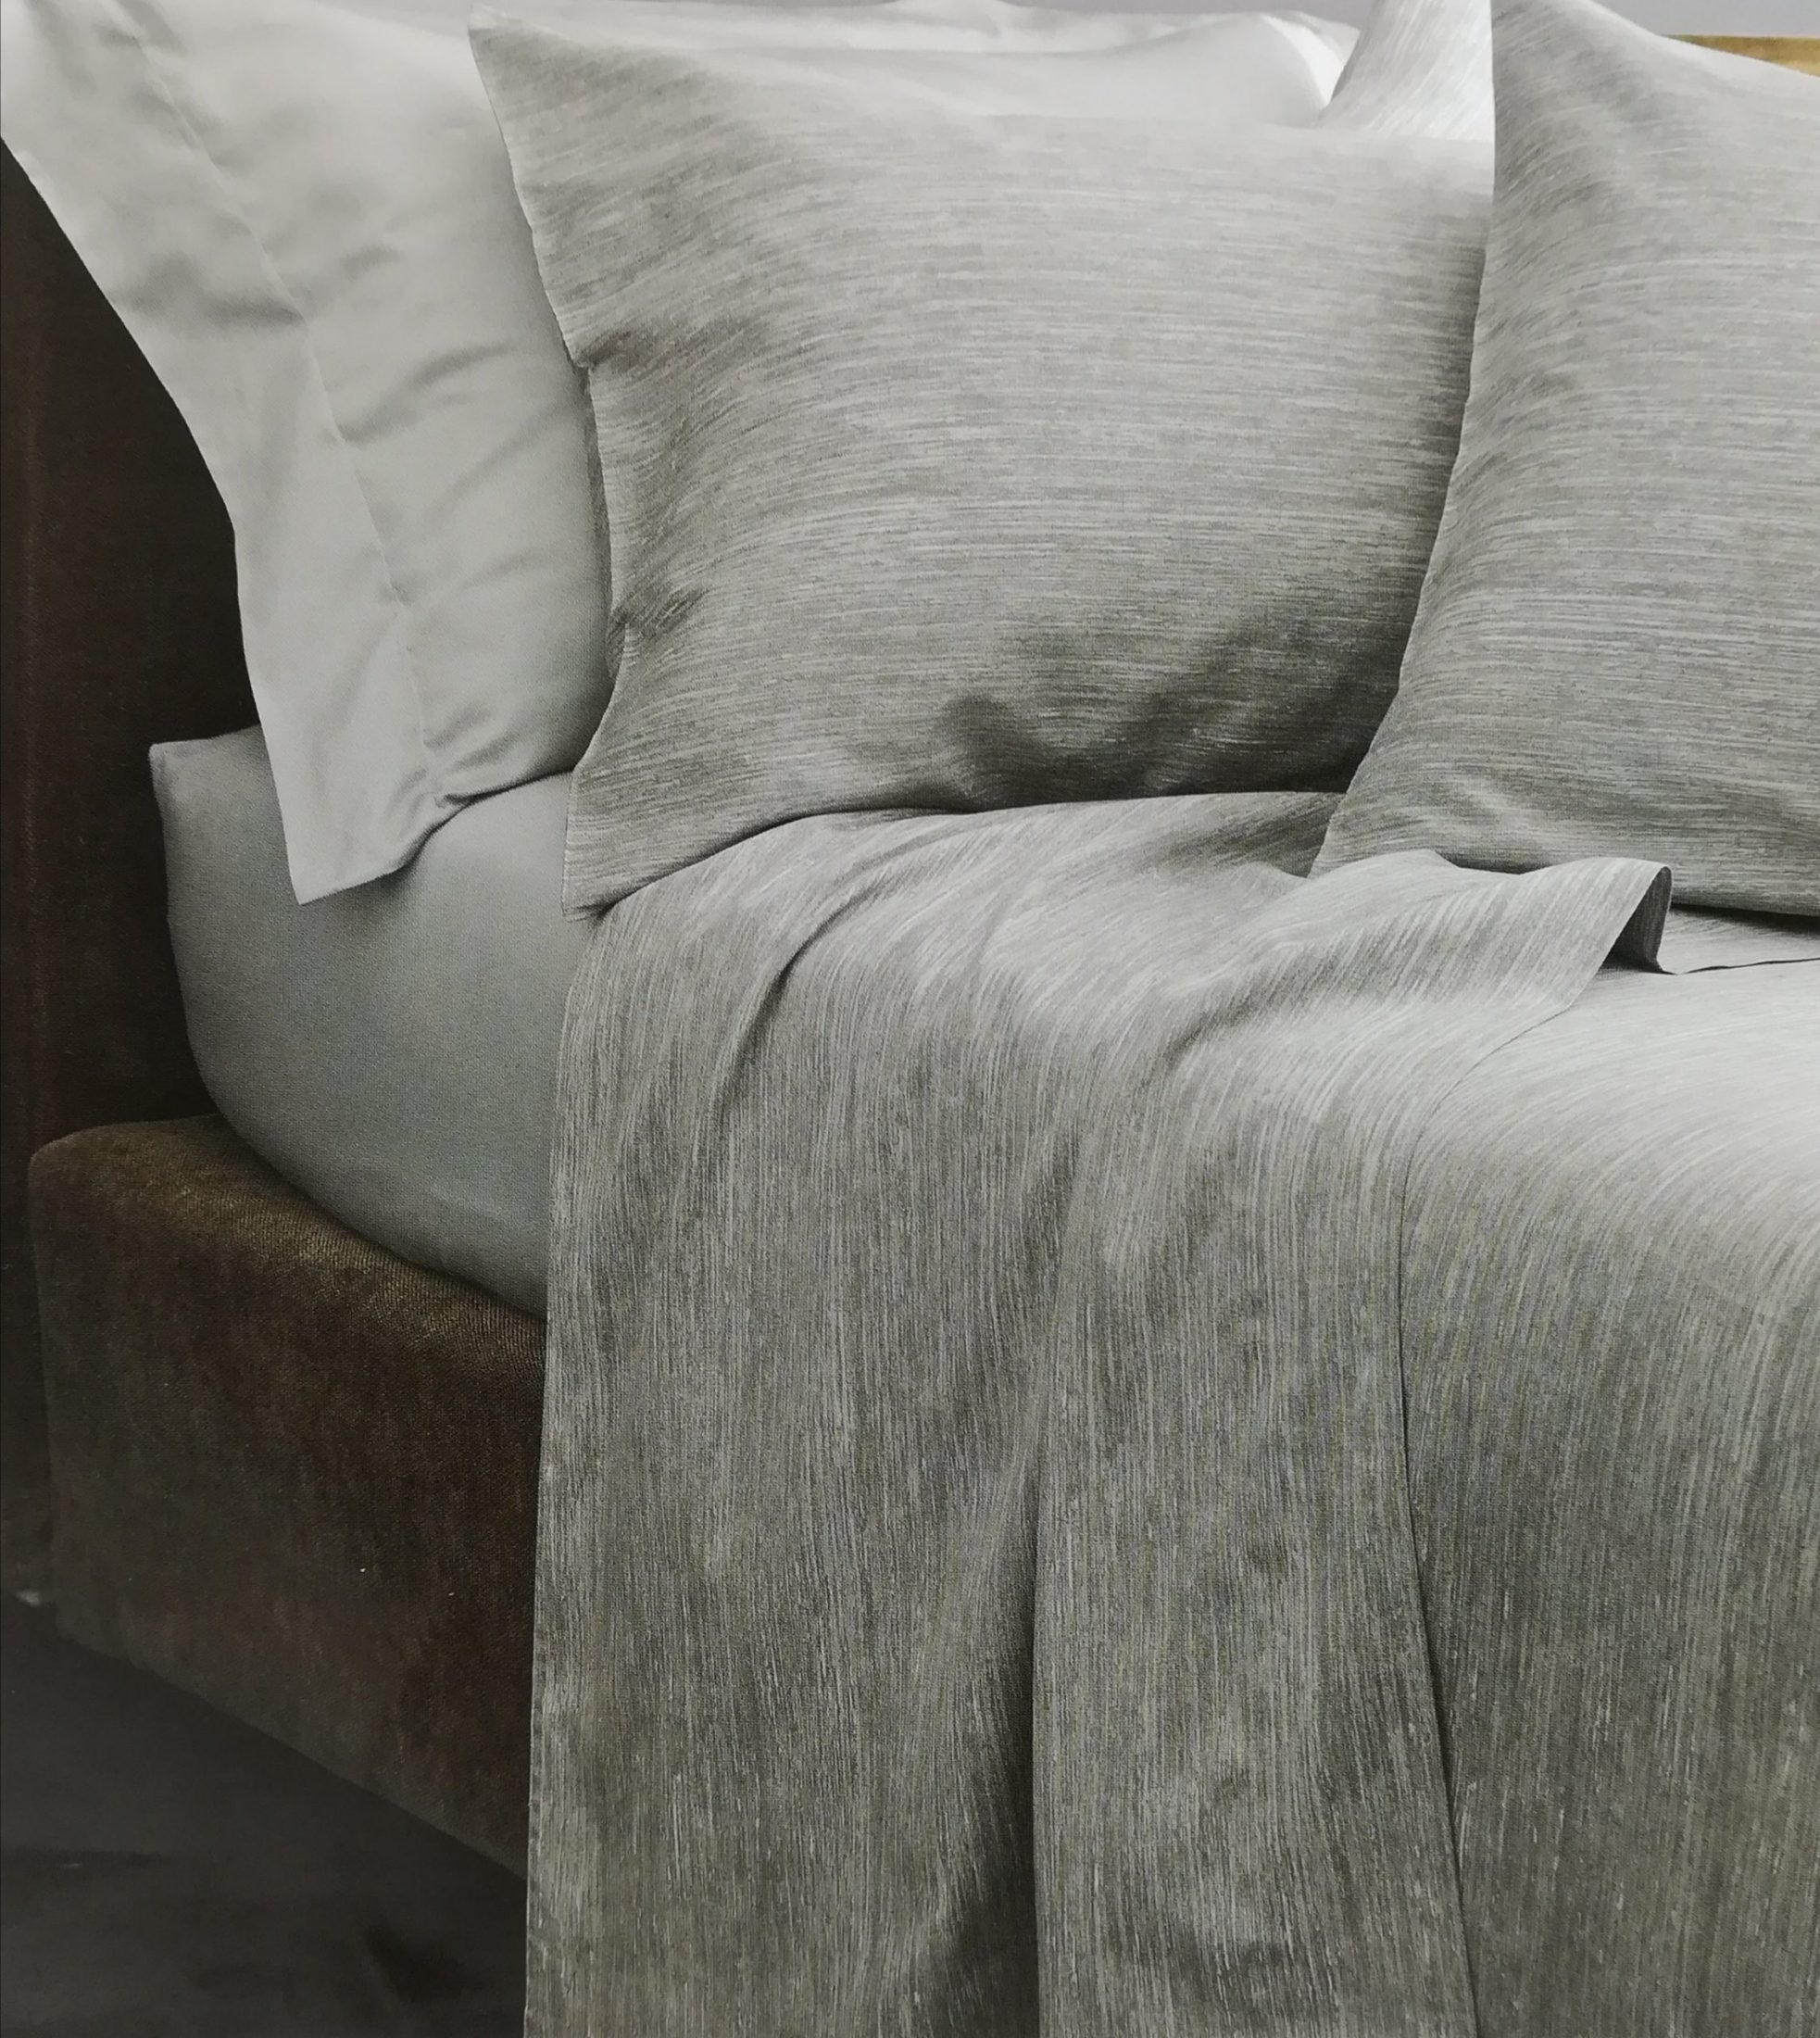 Svad Dondi Completo Lenzuola Matrimoniale Raso Di Cotone Finiseta 77572 Lintea